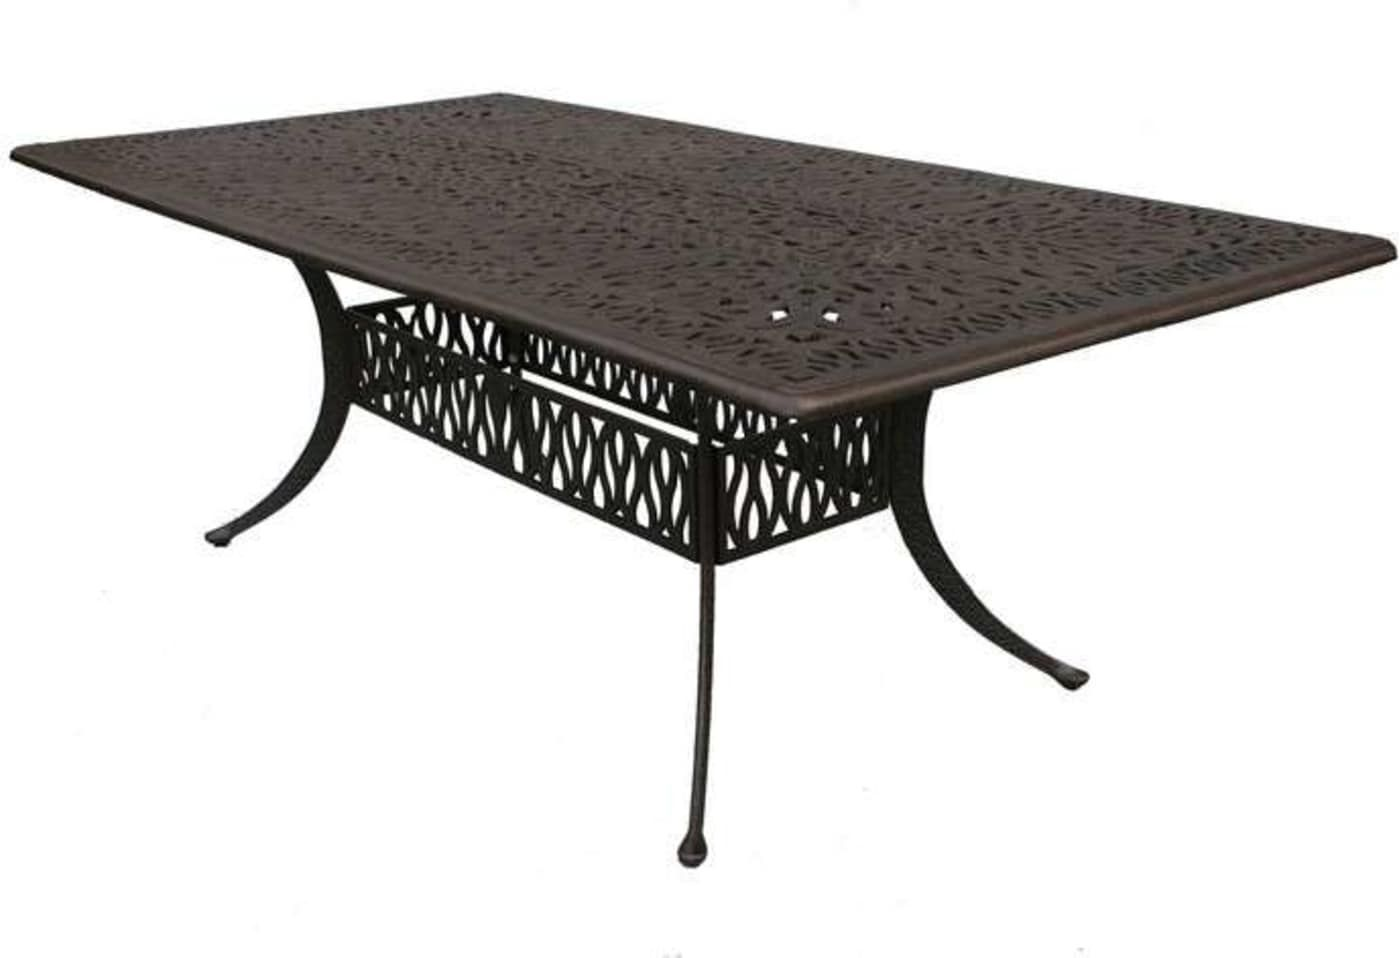 Surprising Darlee Dl707 Xl In 2019 Hot Sellers Table Furniture Home Interior And Landscaping Mentranervesignezvosmurscom